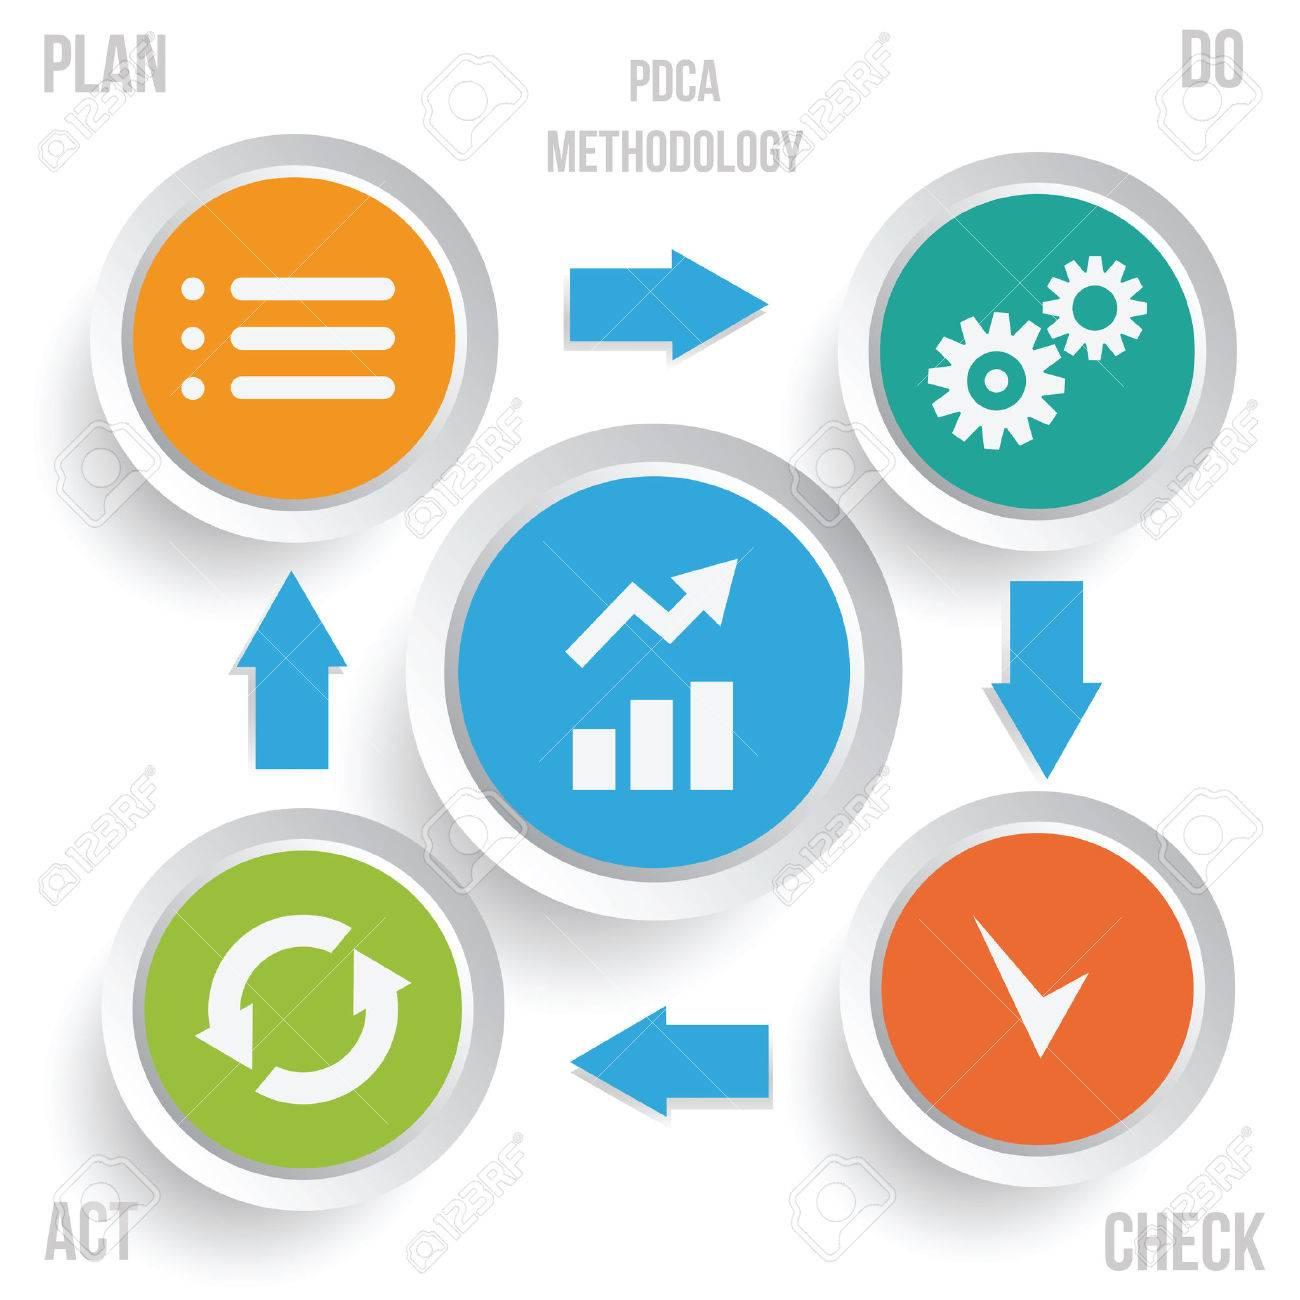 PDCA methodology infographics. Continuous Improvement method vector illustration. - 39075700